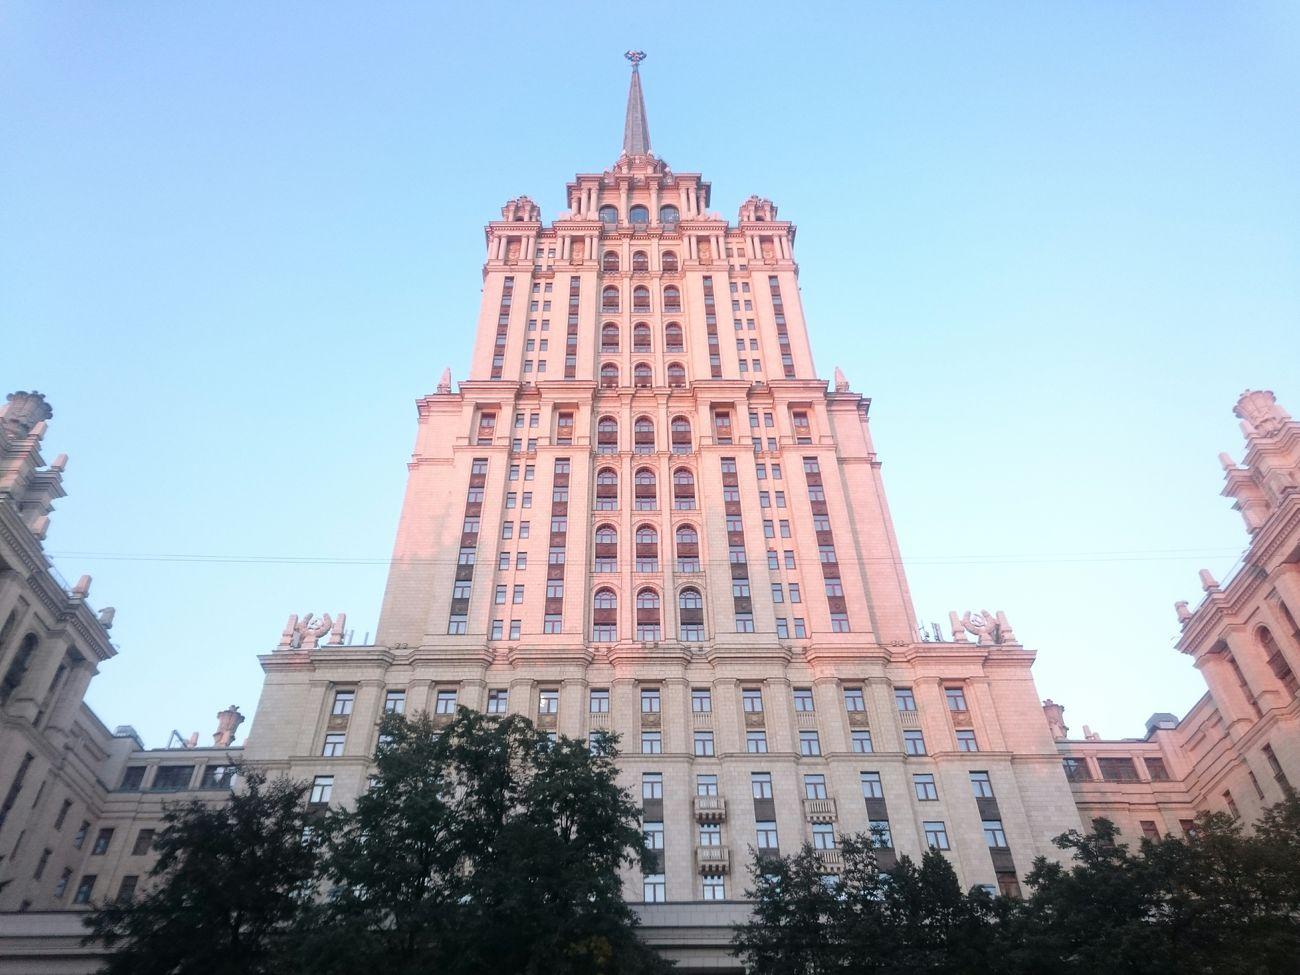 Внутренний дворик гостиница украина Radisson Royal Radisson Закат сталинская высотка ампир